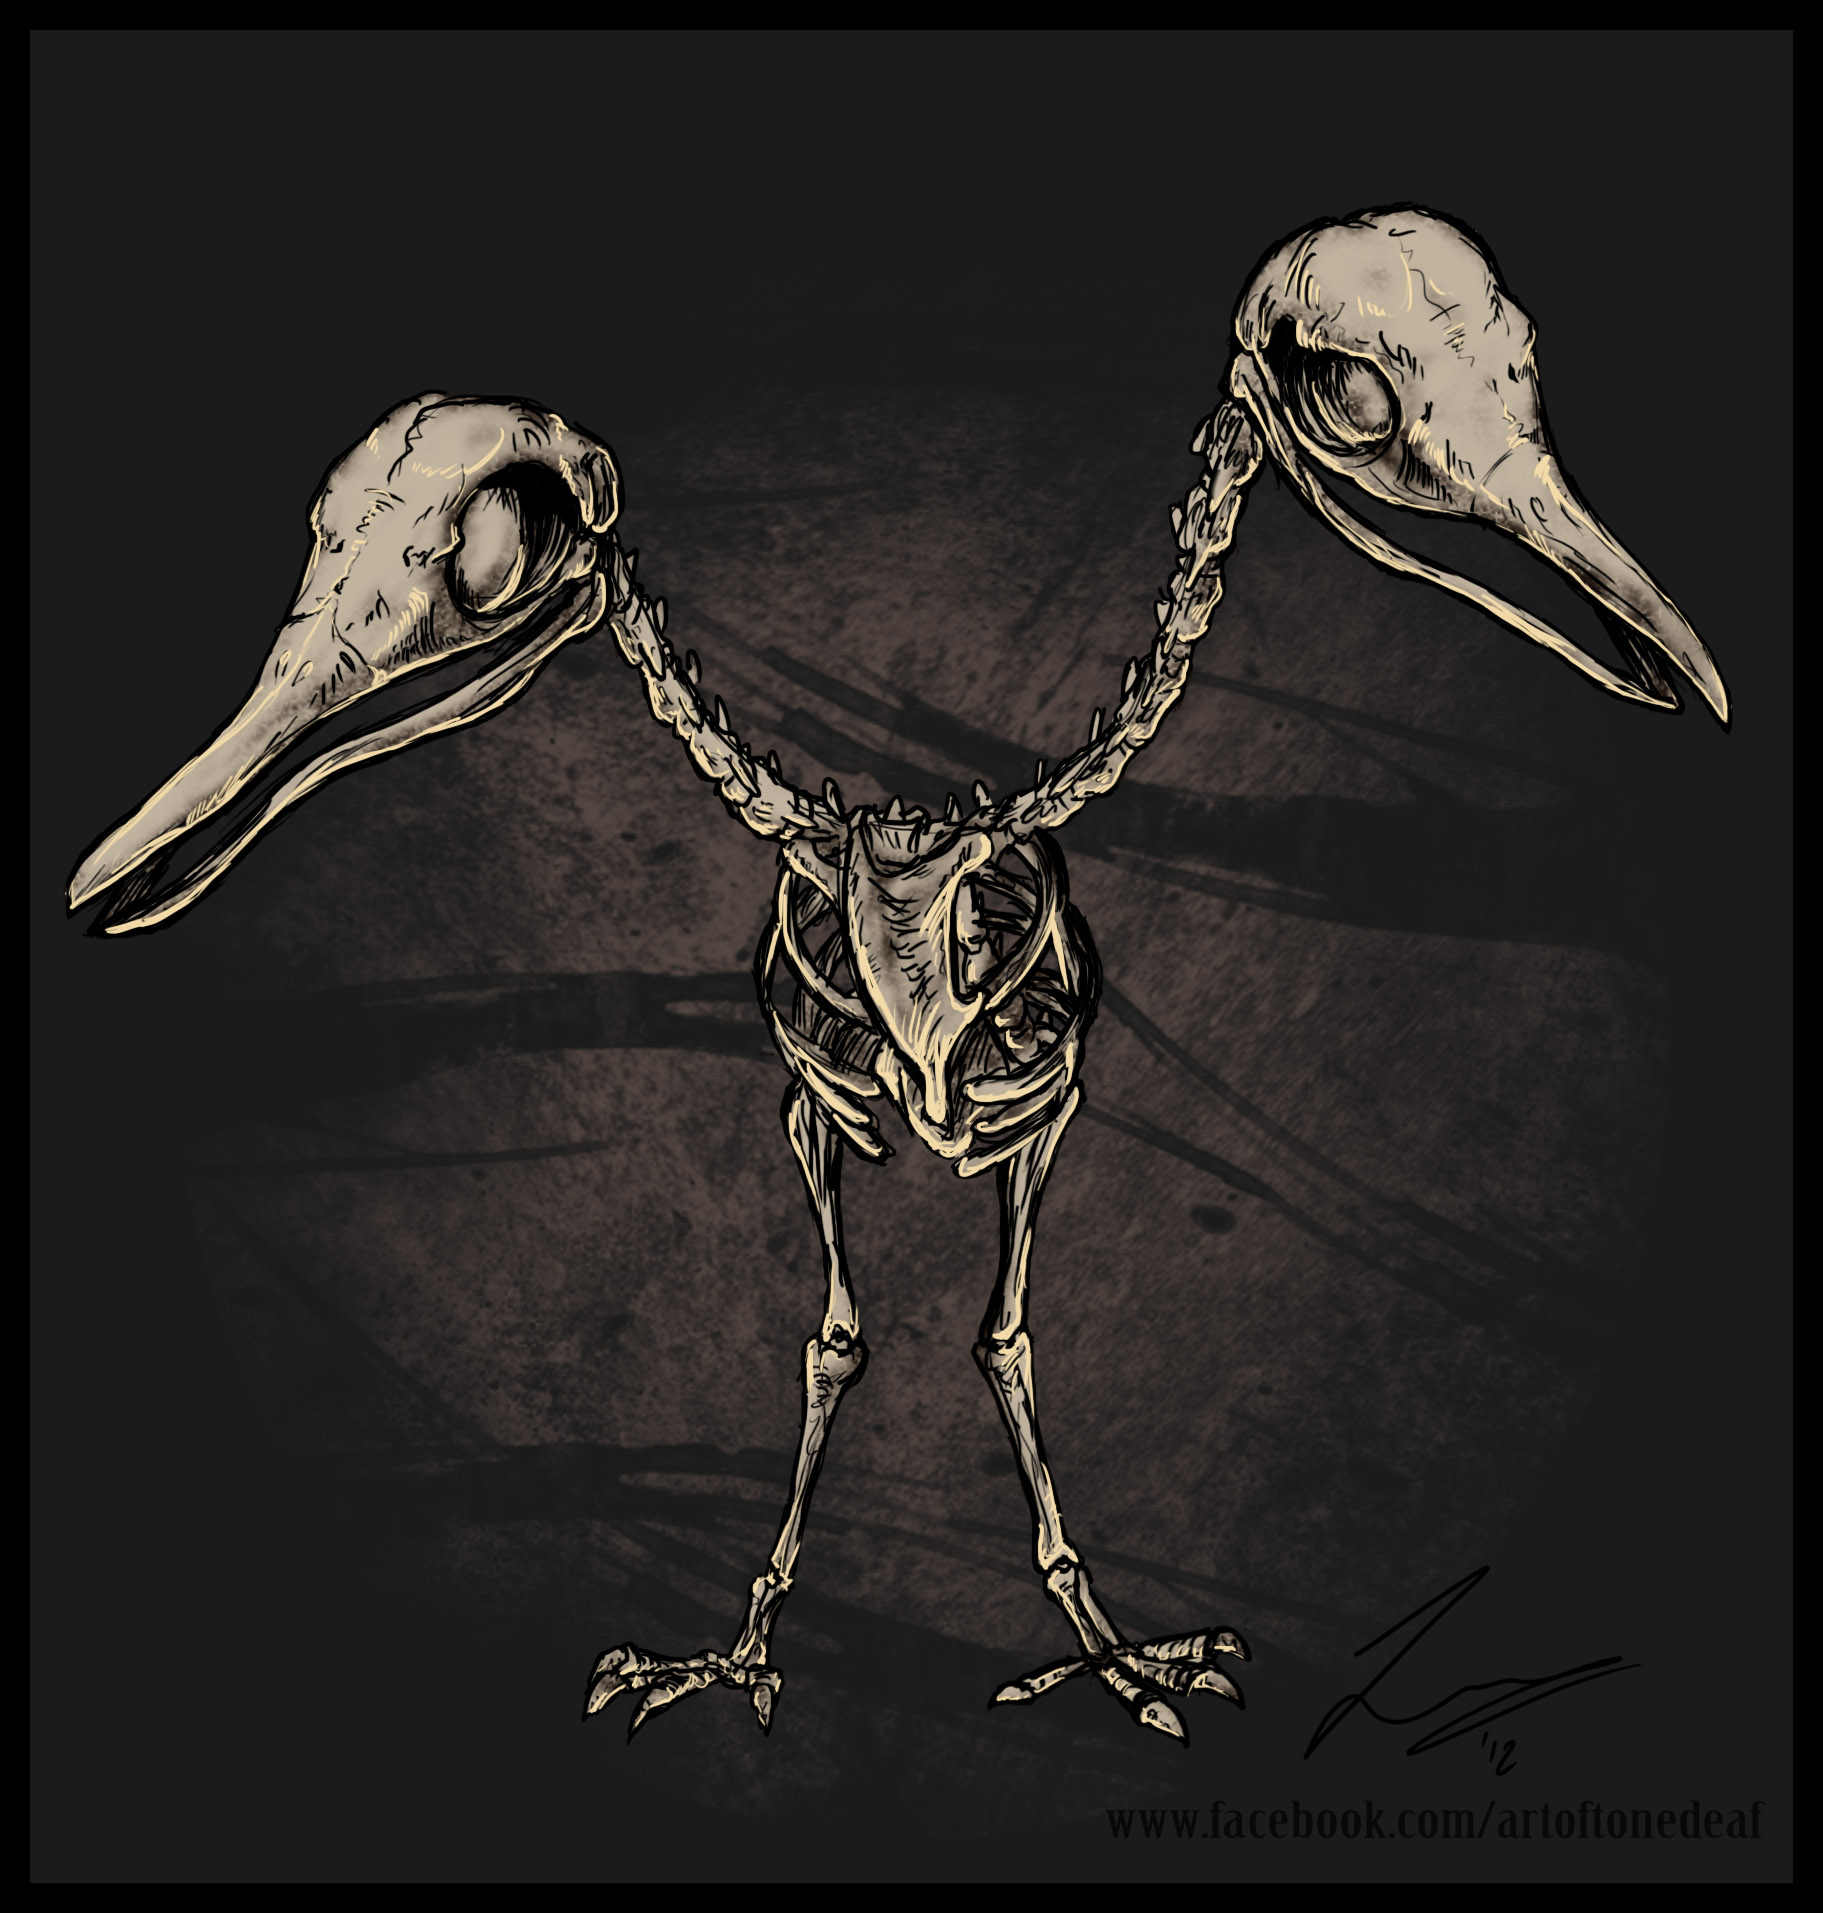 Doduo skeleton by acidic055